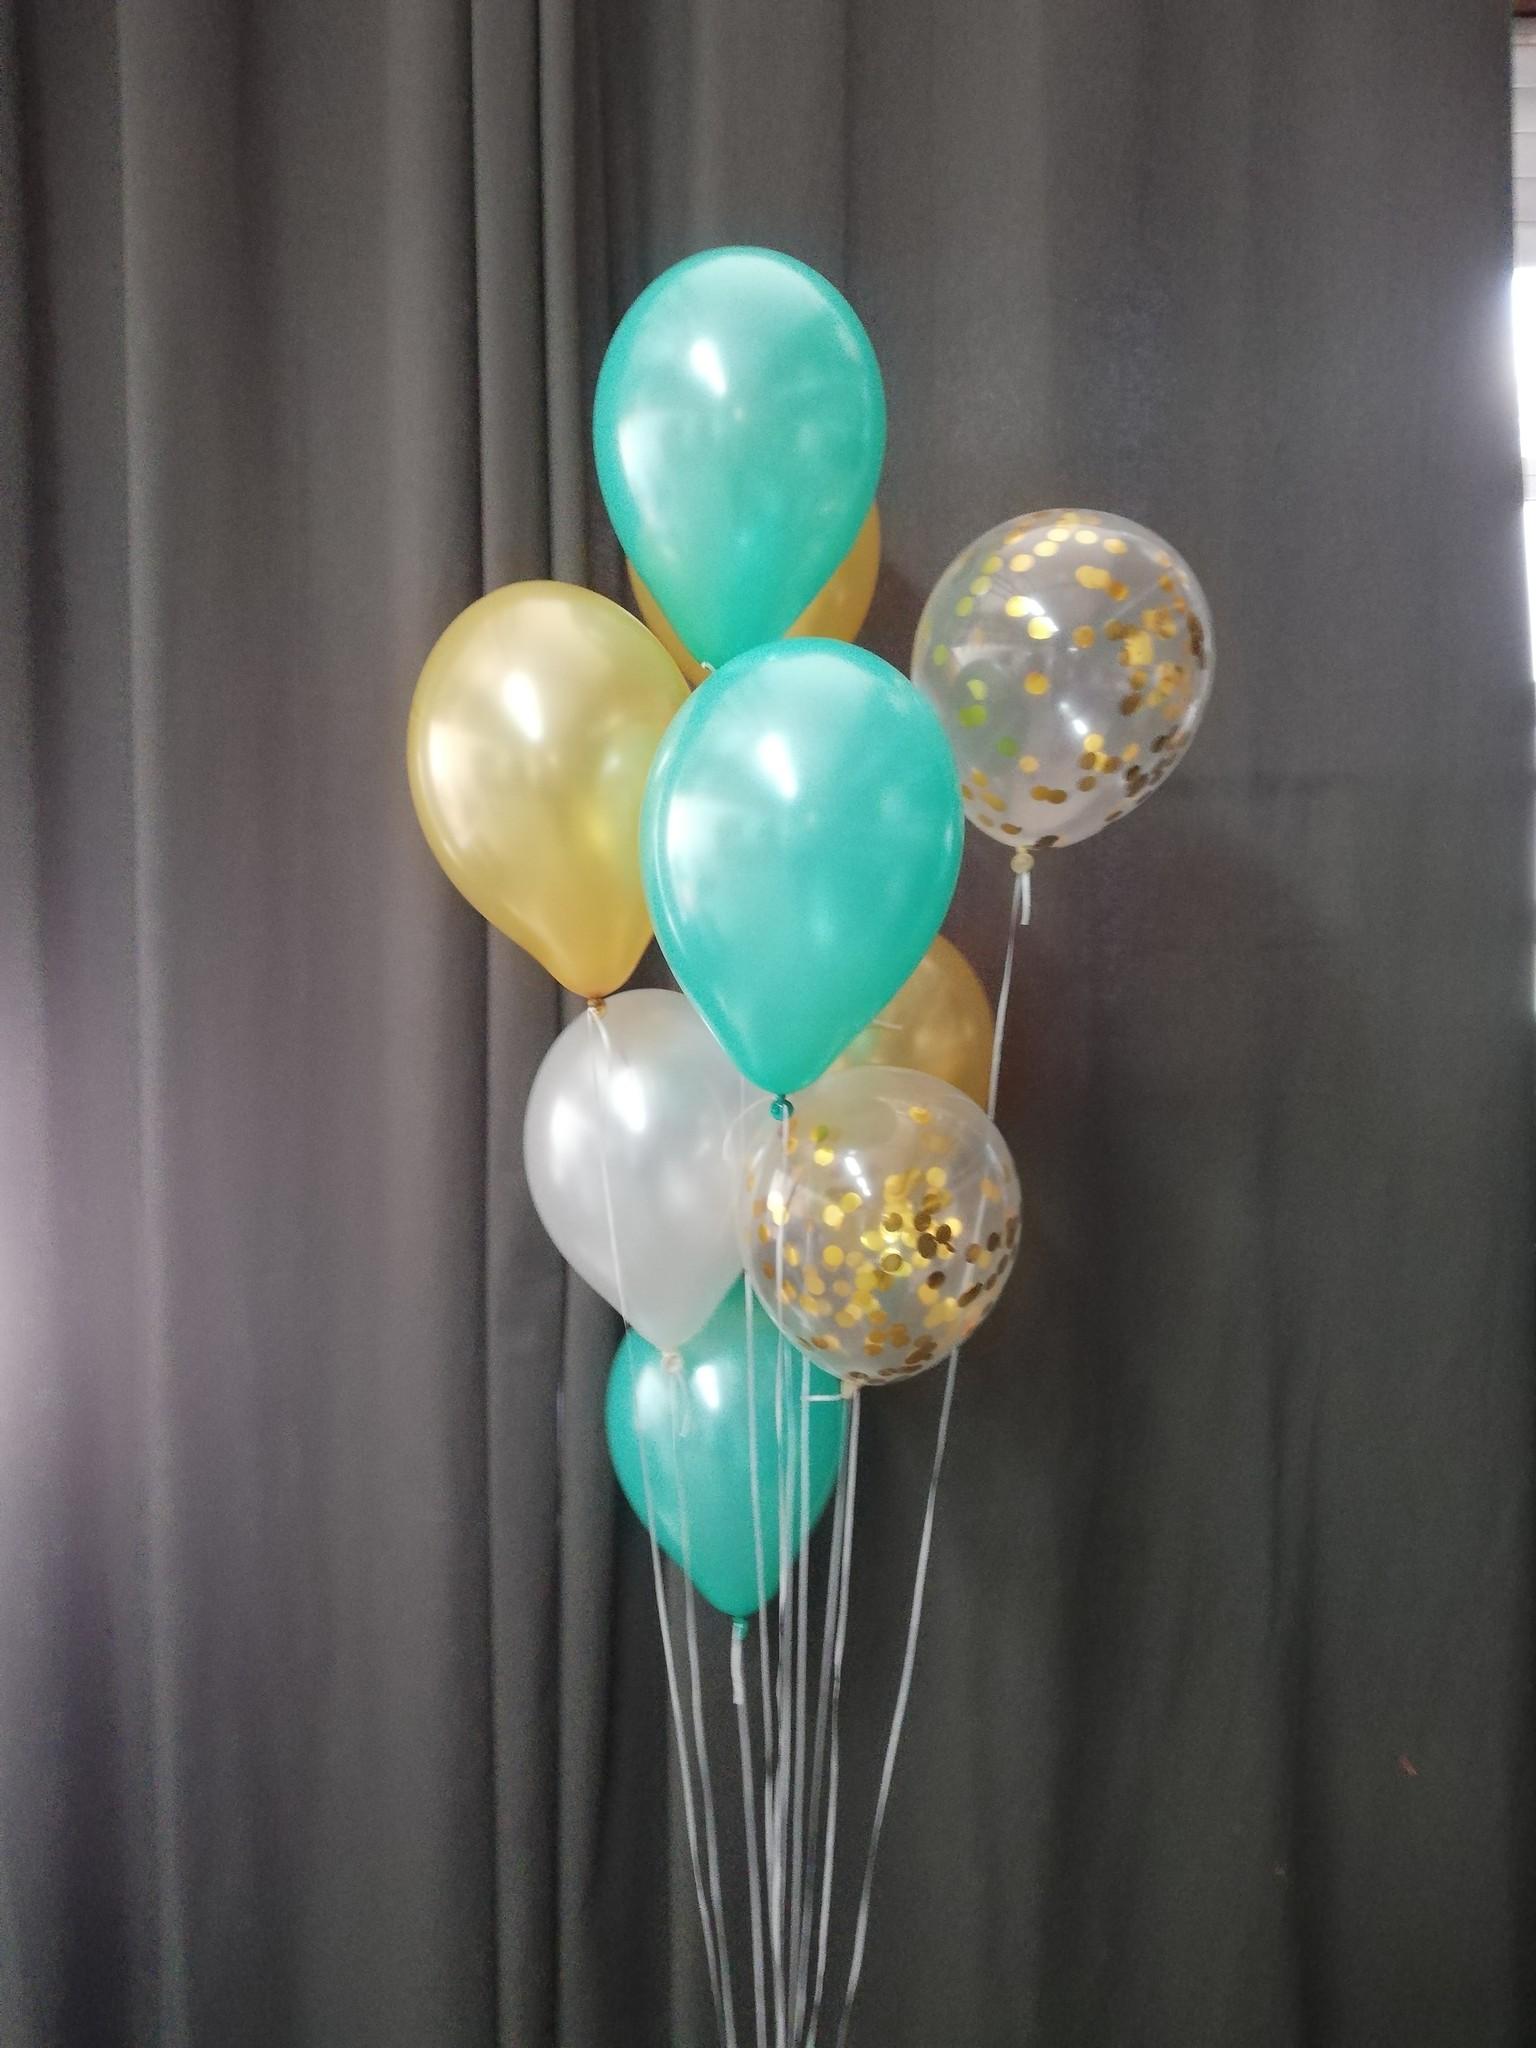 Vloerdecoratie 10 helium ballonnen